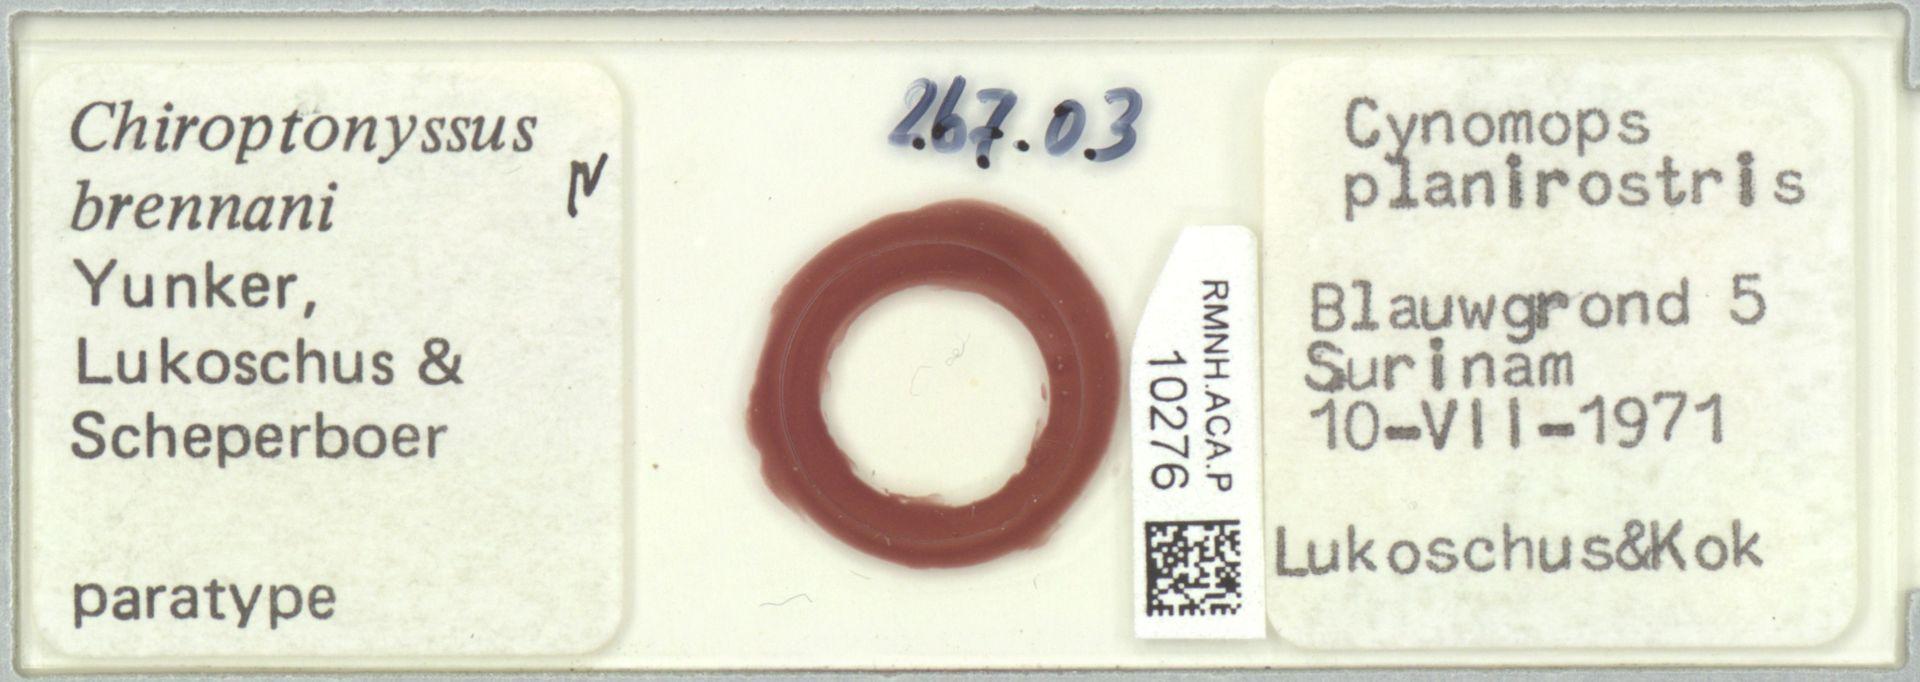 RMNH.ACA.P.10276 | Chiroptonyssus brennani Yunker, Lukoschus & Scheperboer